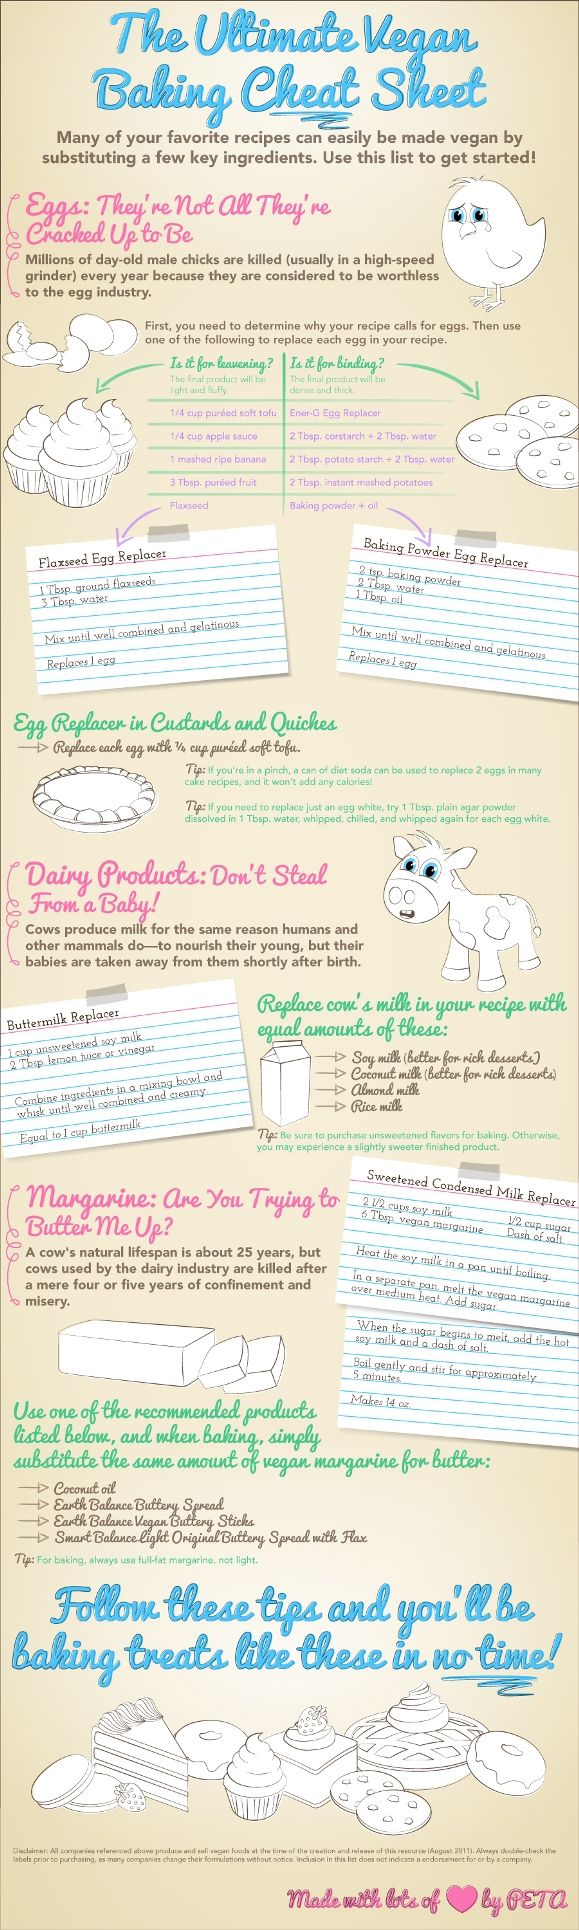 The Ultimate #Vegan Baking Cheat SheetEggs Allergies, Baking Tips, Baking Substitute, Baking Cheat, Cheat Sheets, Dairy Free, Vegan Baking, Cooking Tips, Cheatsheet